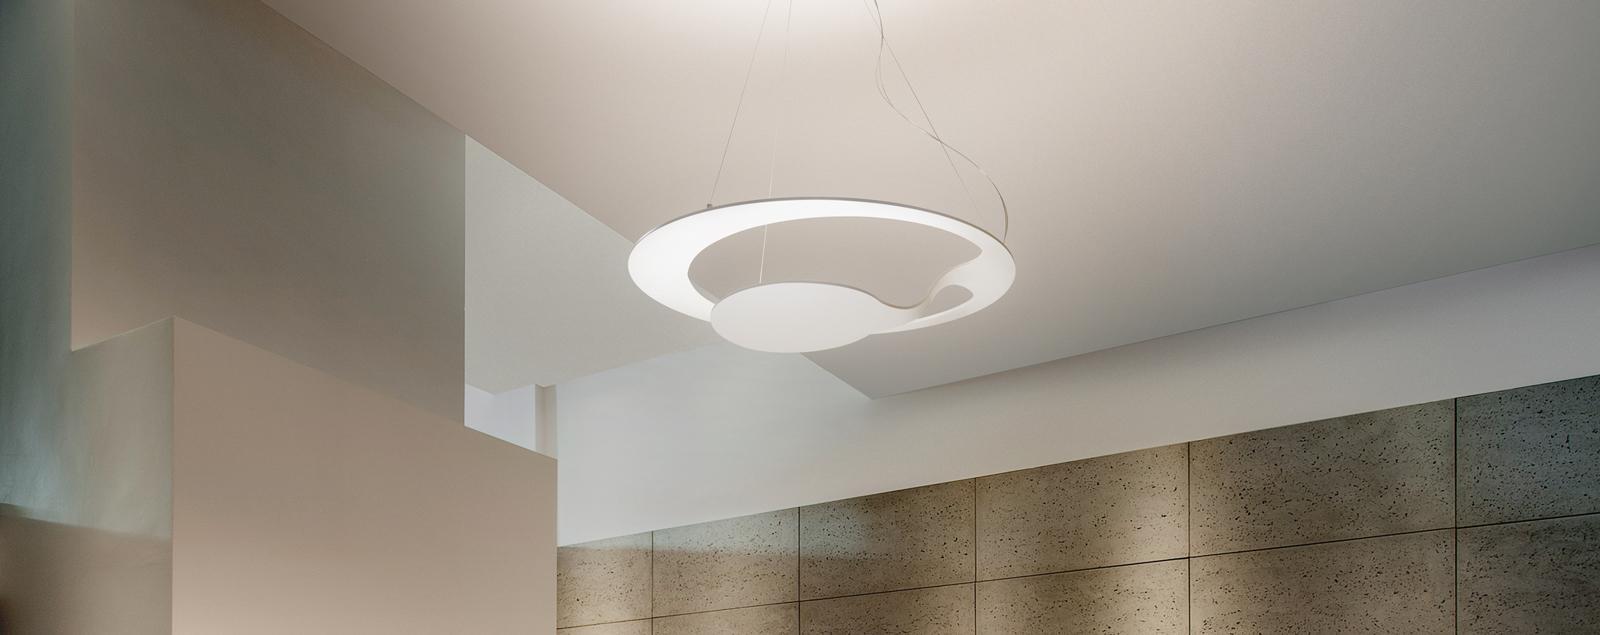 F31 Glu pendant lamp - Fabbian Illuminazione